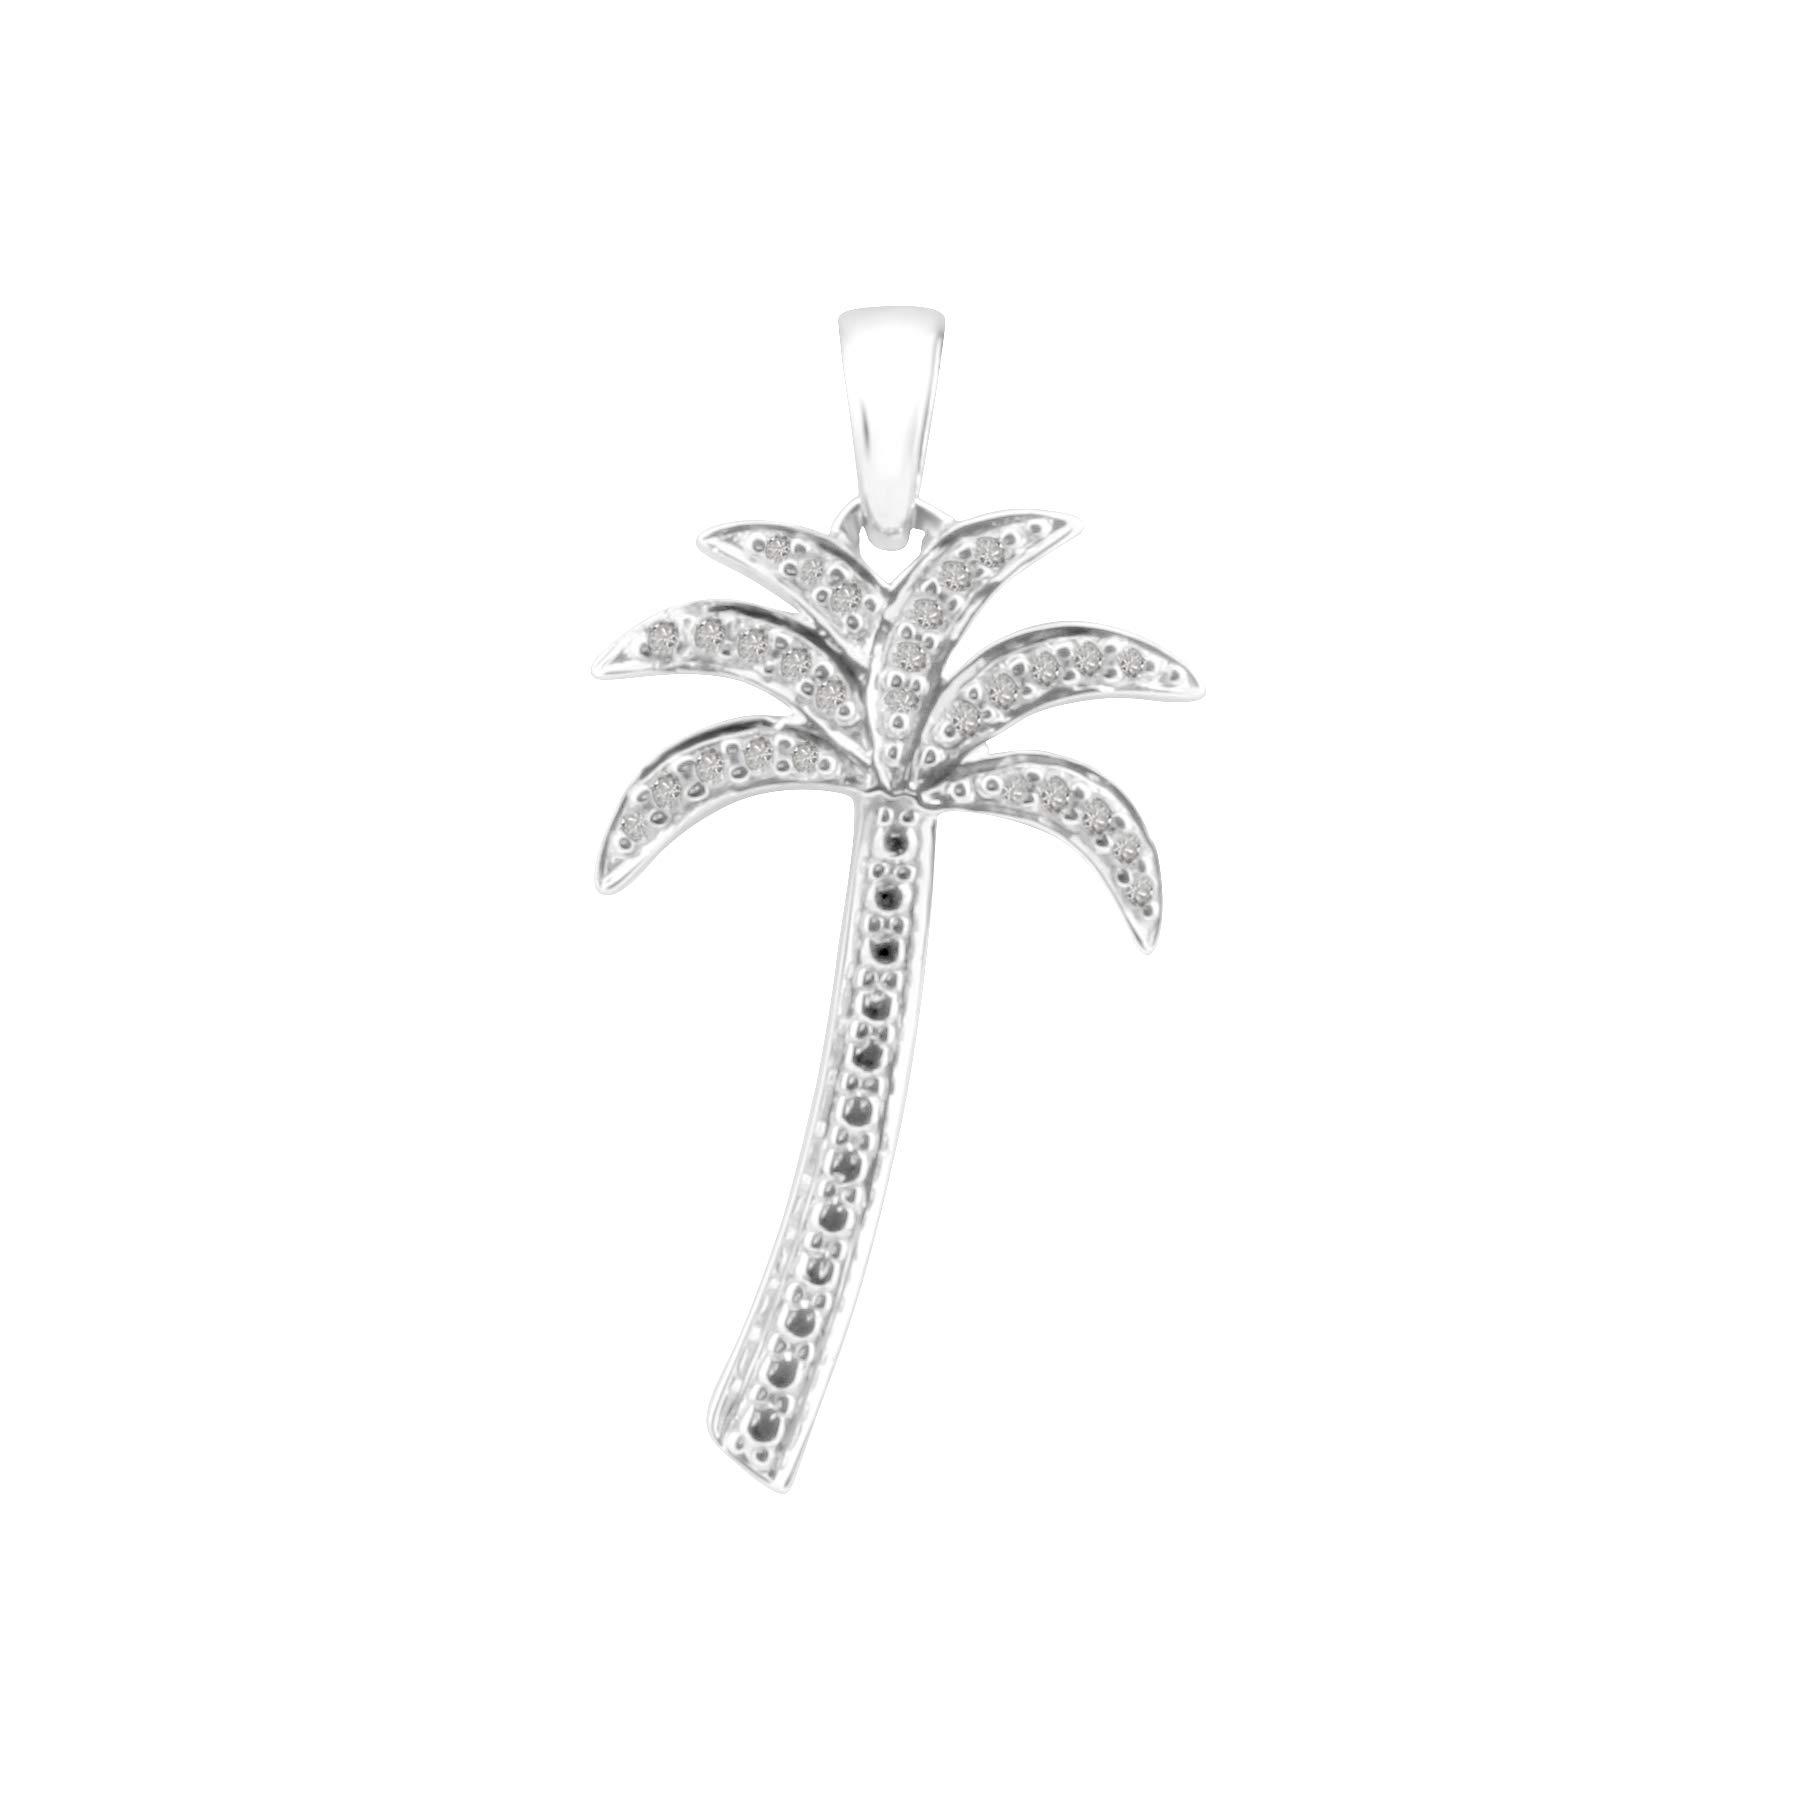 White Diamond Pendant Goldenstar 0.10Ct 925 Sterling Silver Palm Tree Pendant